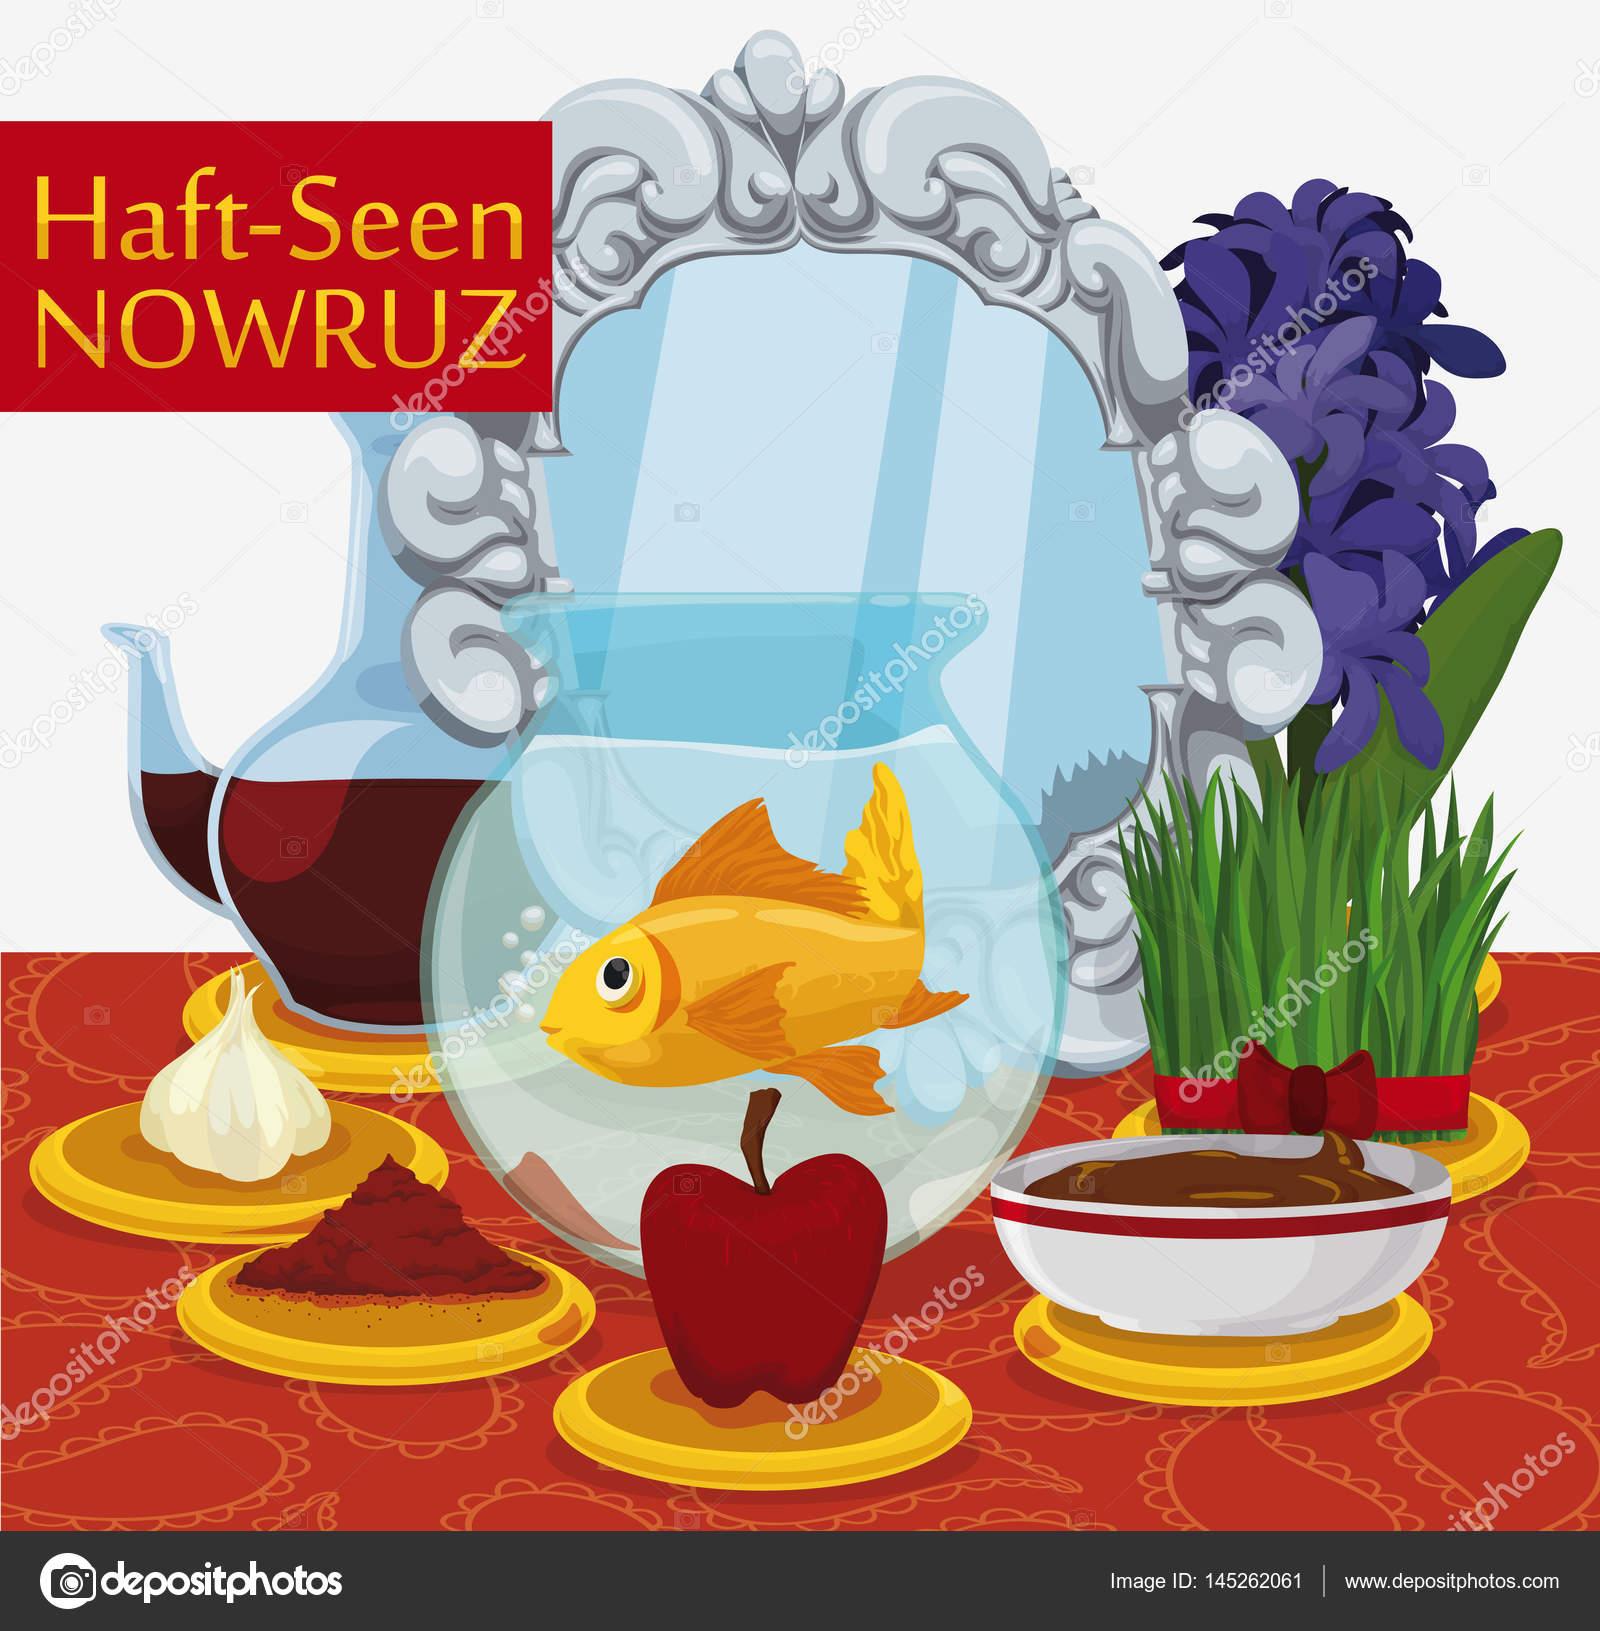 Norouz Stock Vectors Royalty Free Norouz Illustrations Depositphotos